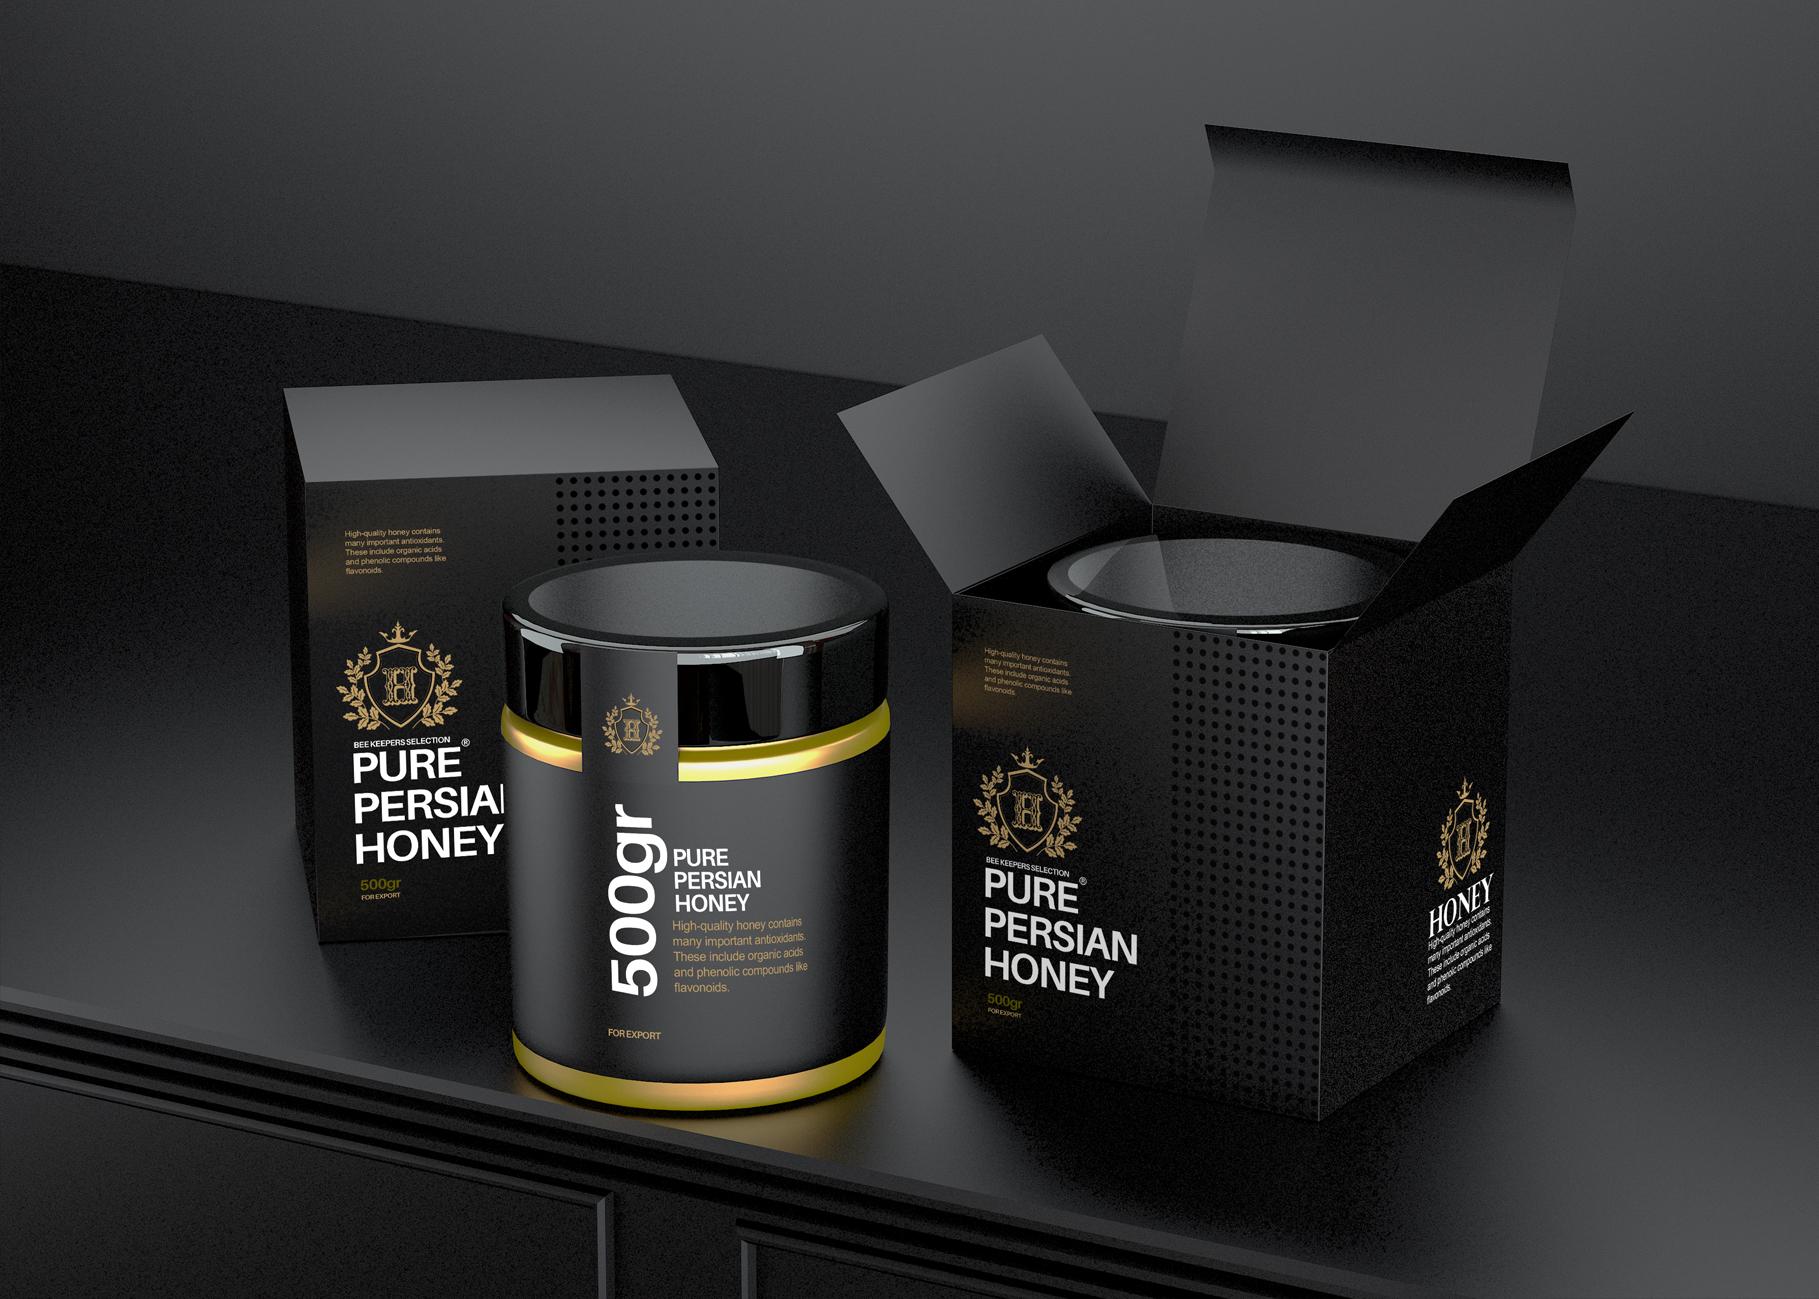 Taha Fakouri Creats New Persian Pure Honey Packaging Design